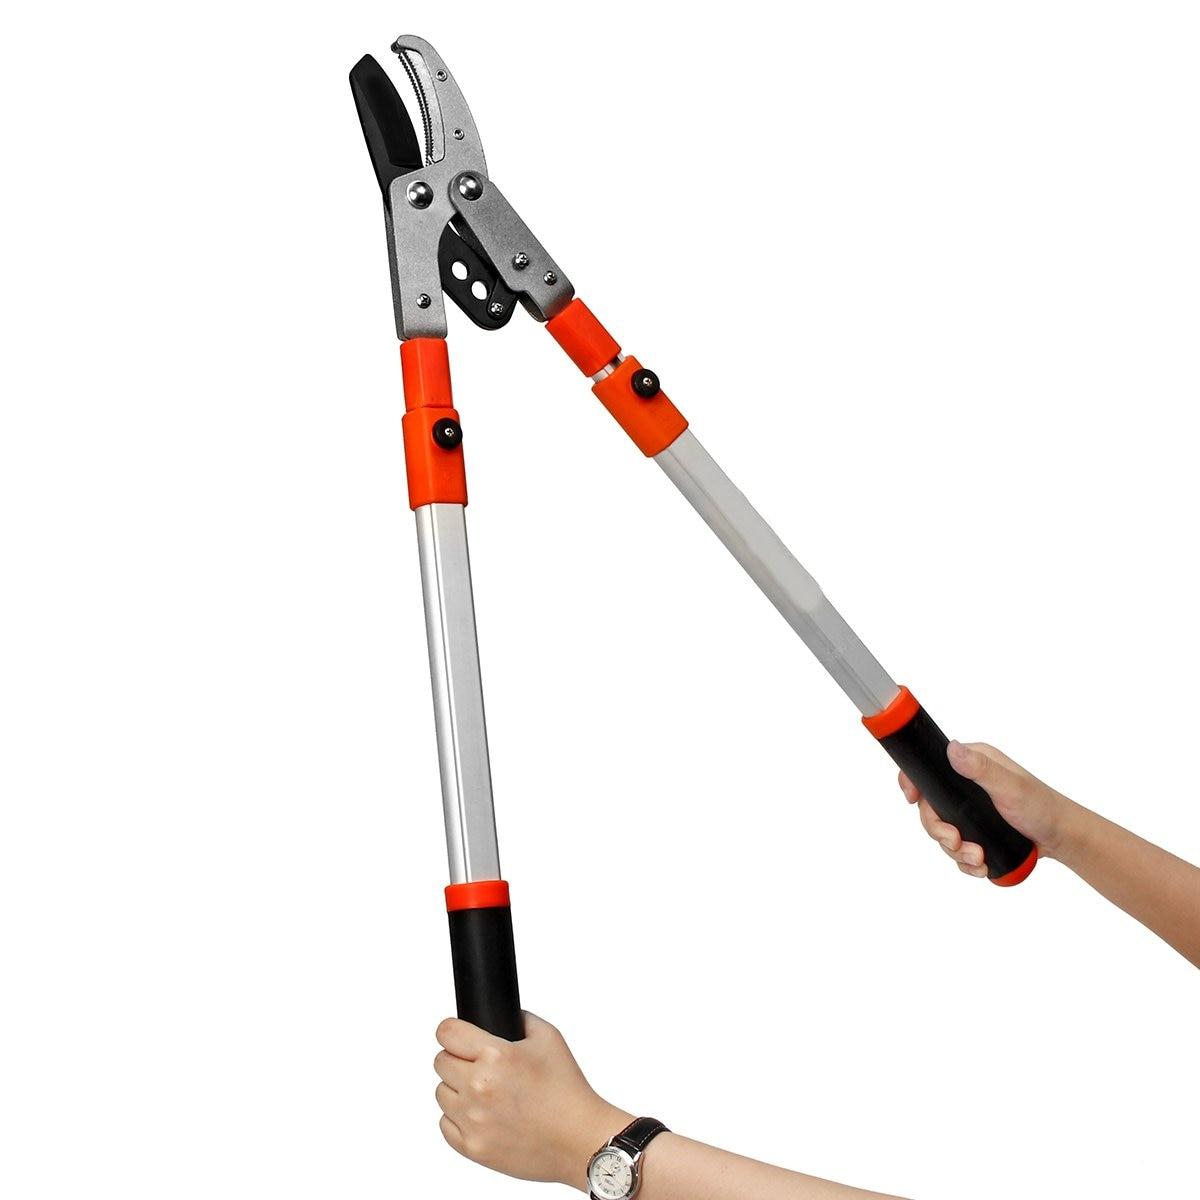 Pruning Tools Telescopic Tree Ratchet Lopper Pruner Extending Garden Cutter Branch Shear Tools Garden Hand Tools